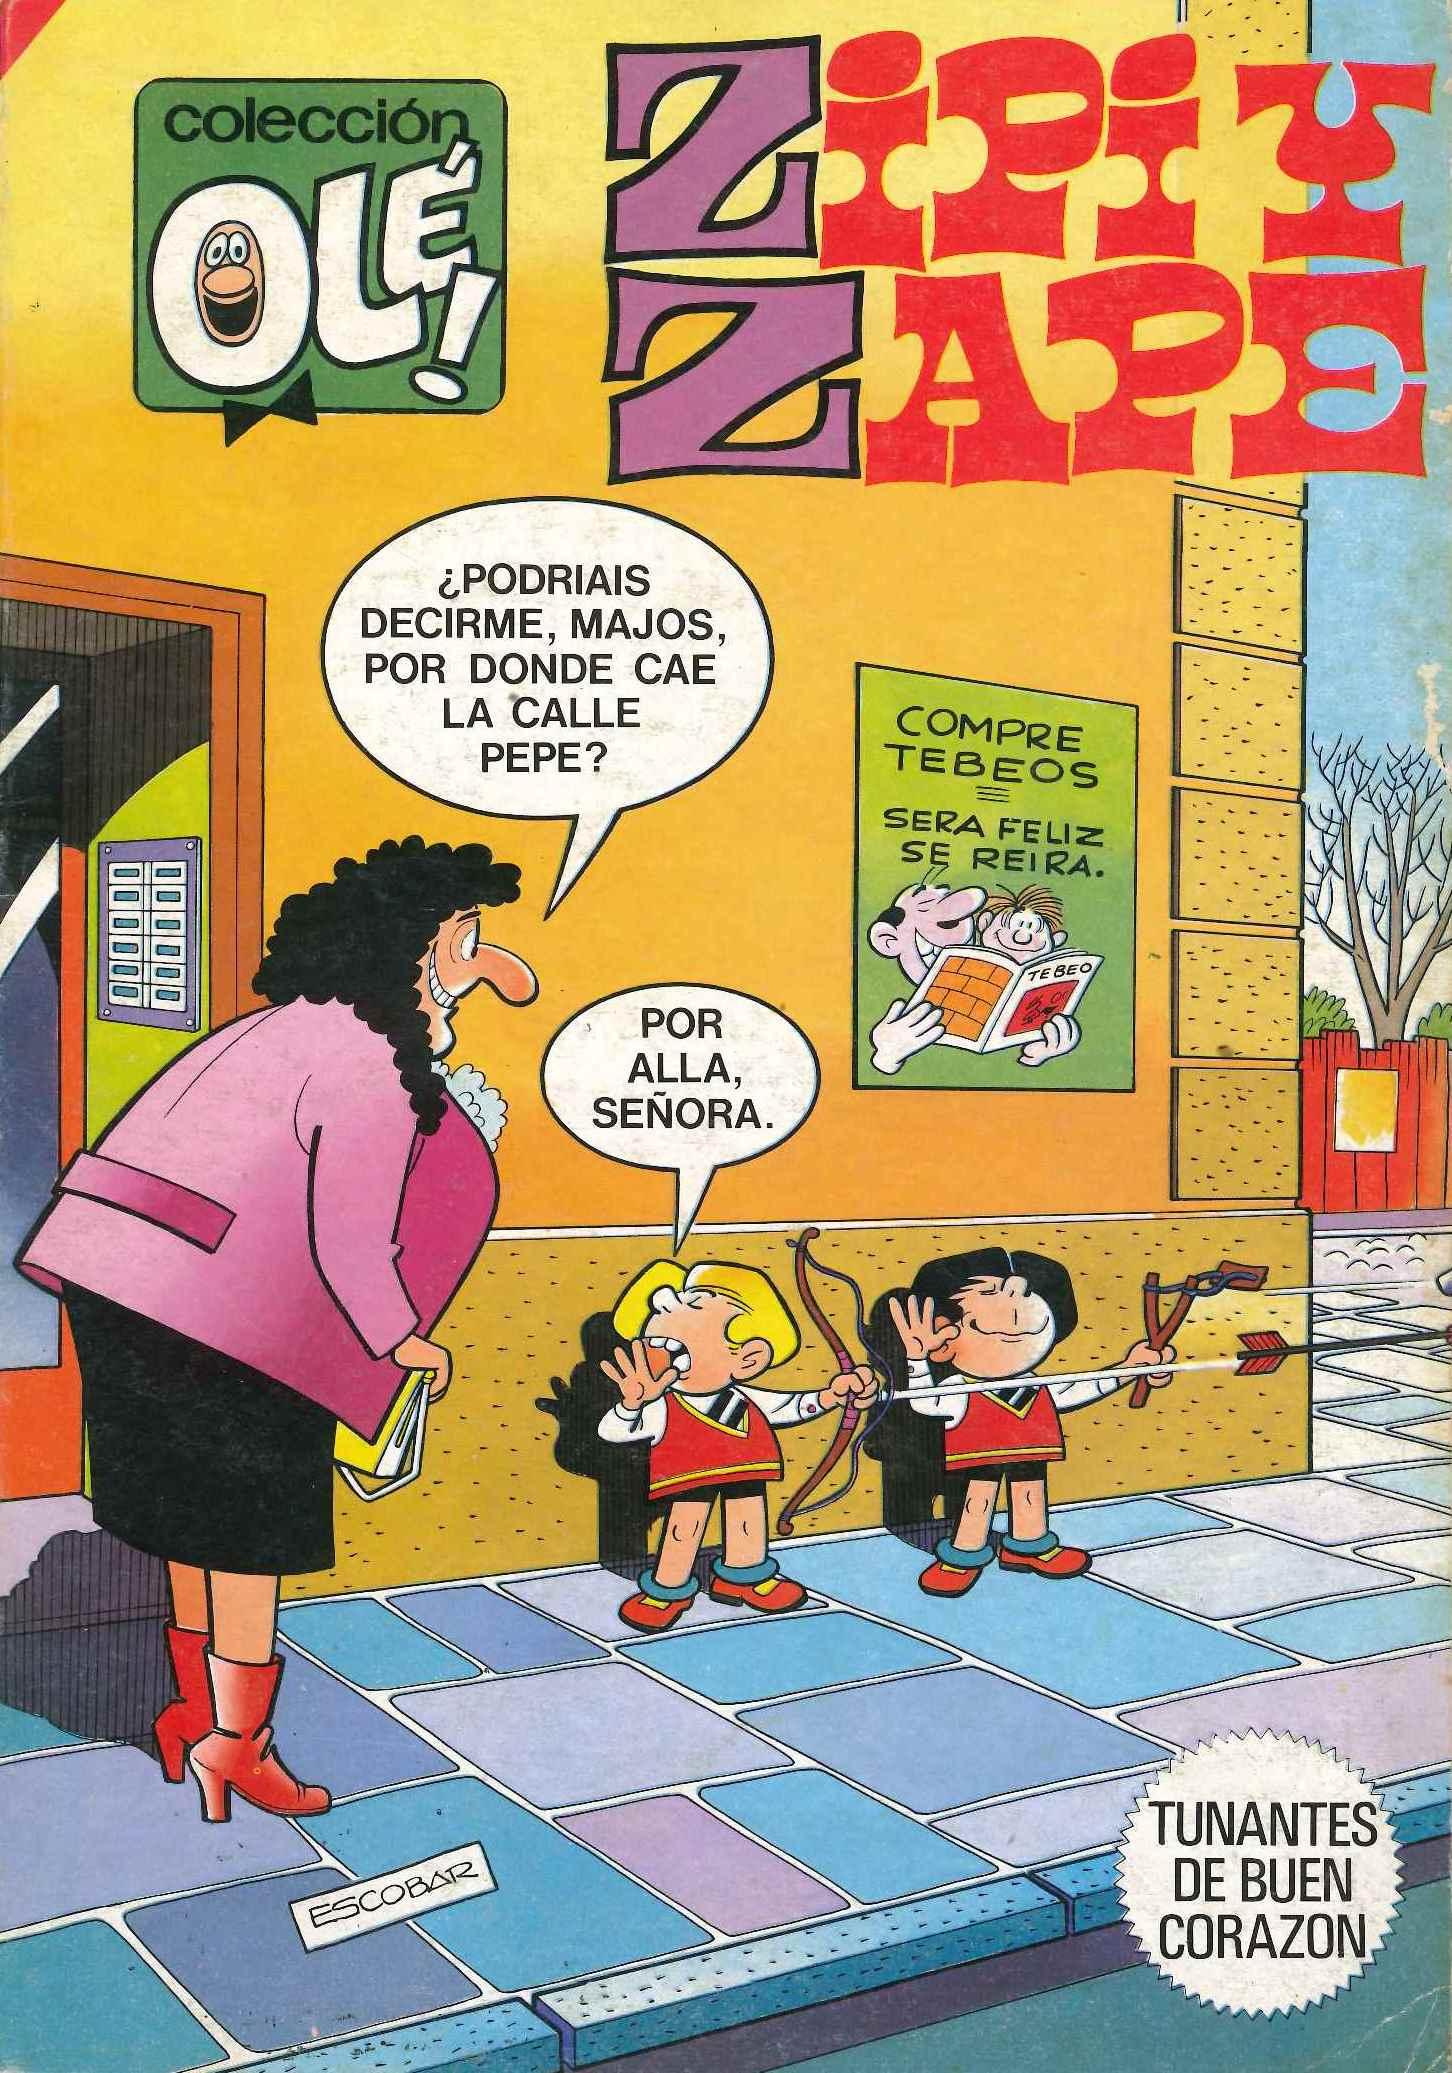 Colección Olé! 301 - Zipi y Zape. Tunantes de buen corazón